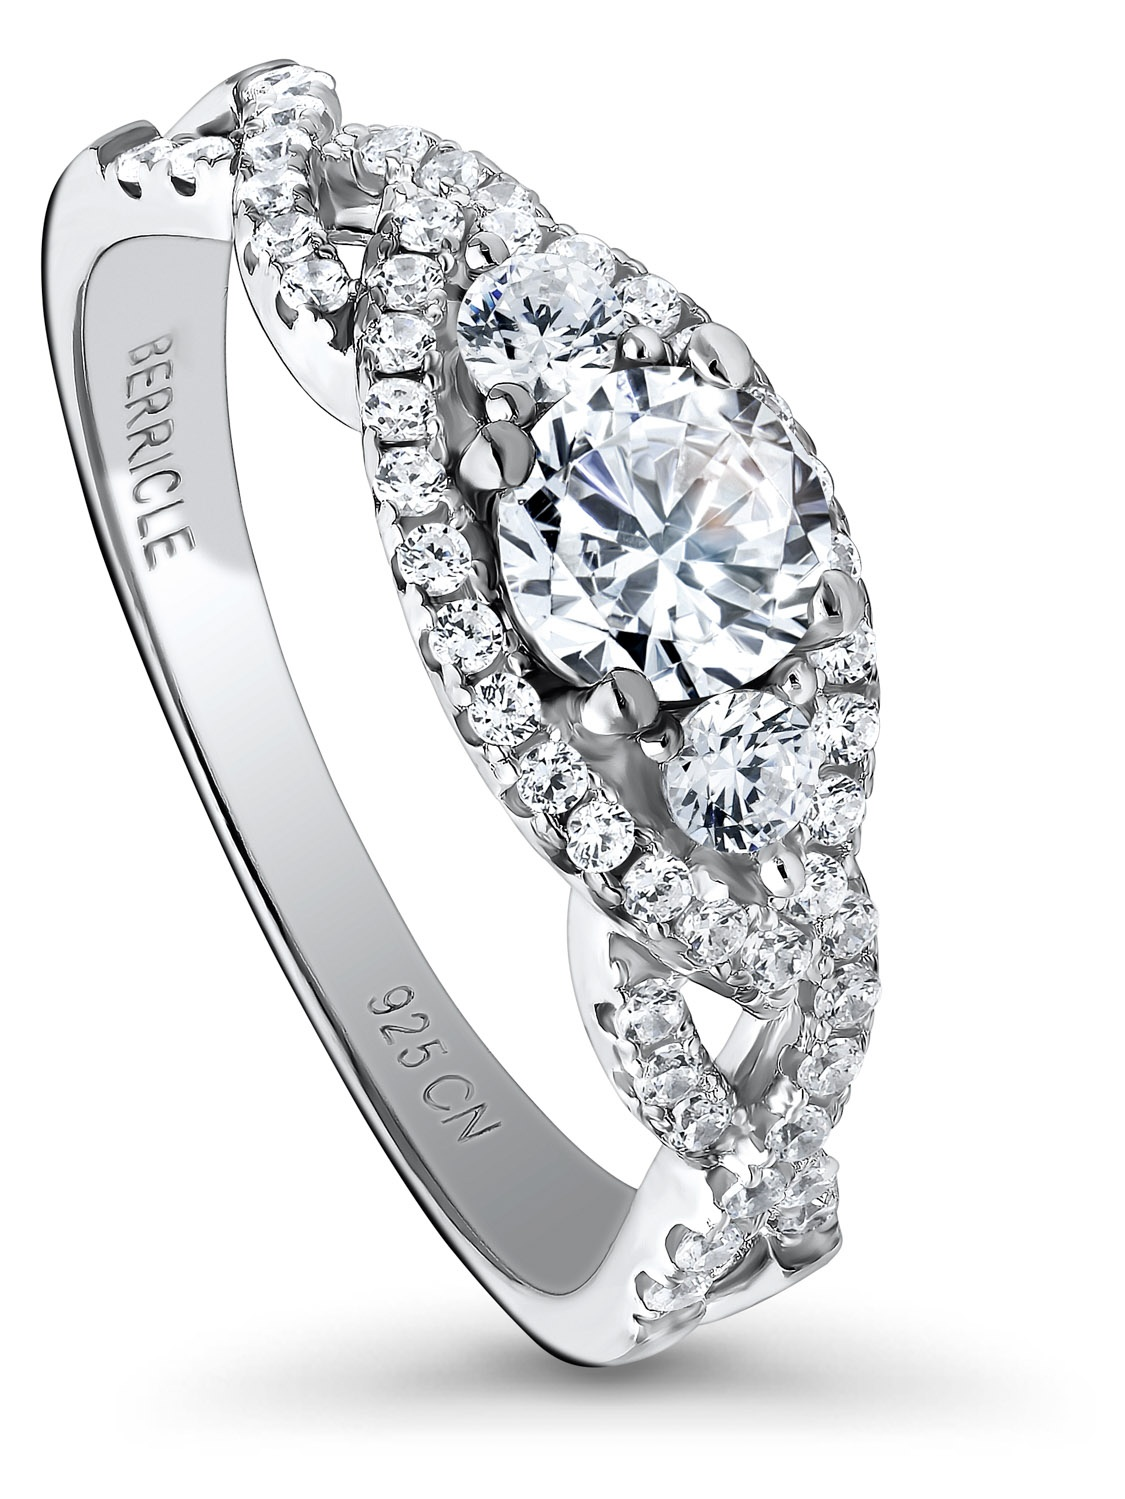 Rhodium Plated Sterling Silver Halo 3-Stone Woven Promise Ring Set w/ Swarovski Zirconia Size 10